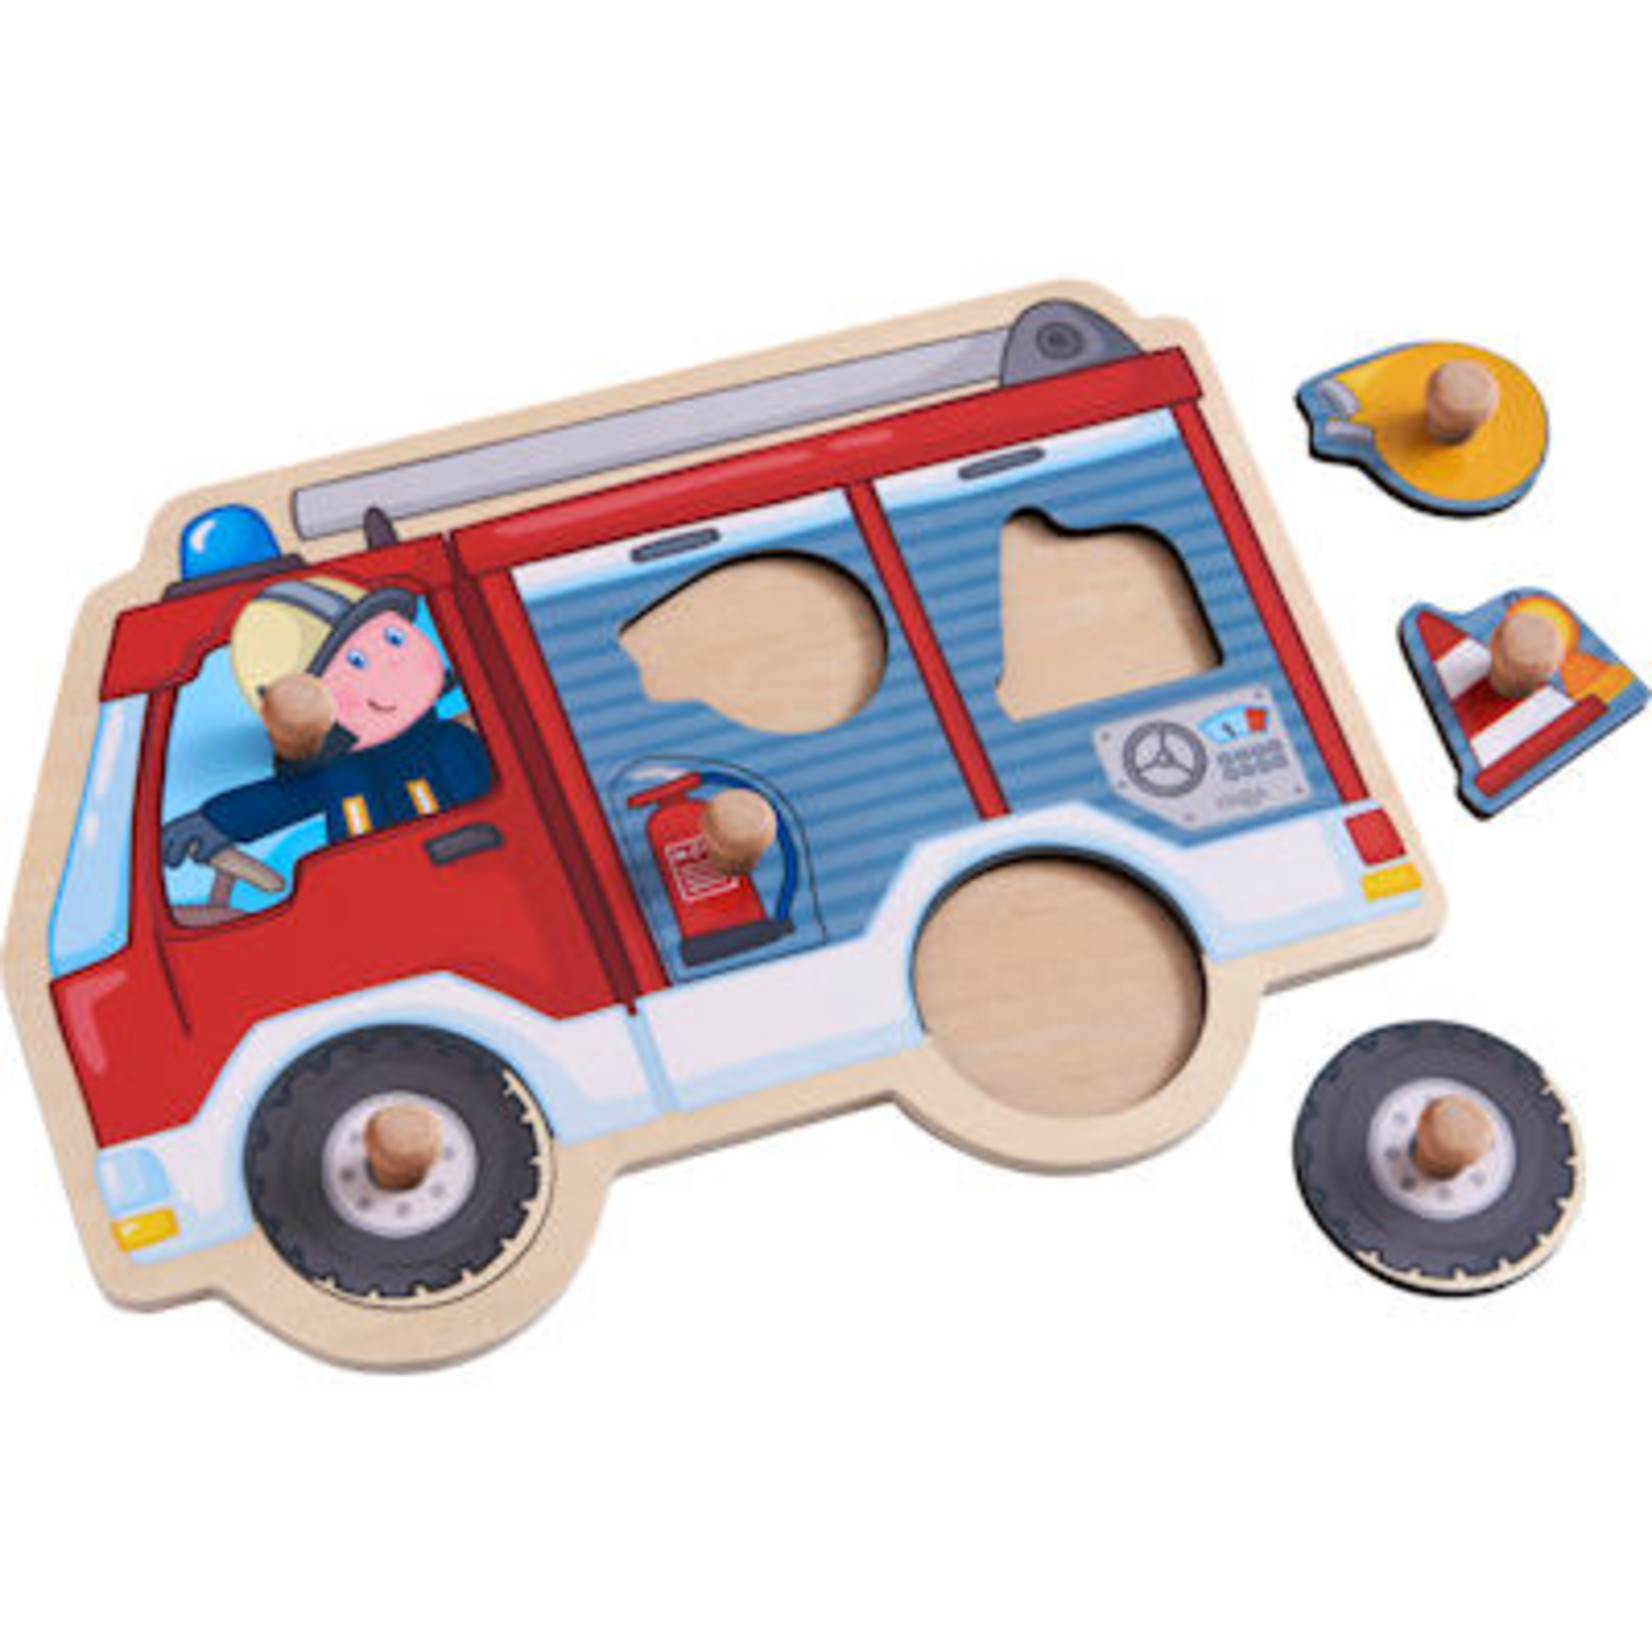 Haba Houten inlegpuzzel Brandweerauto